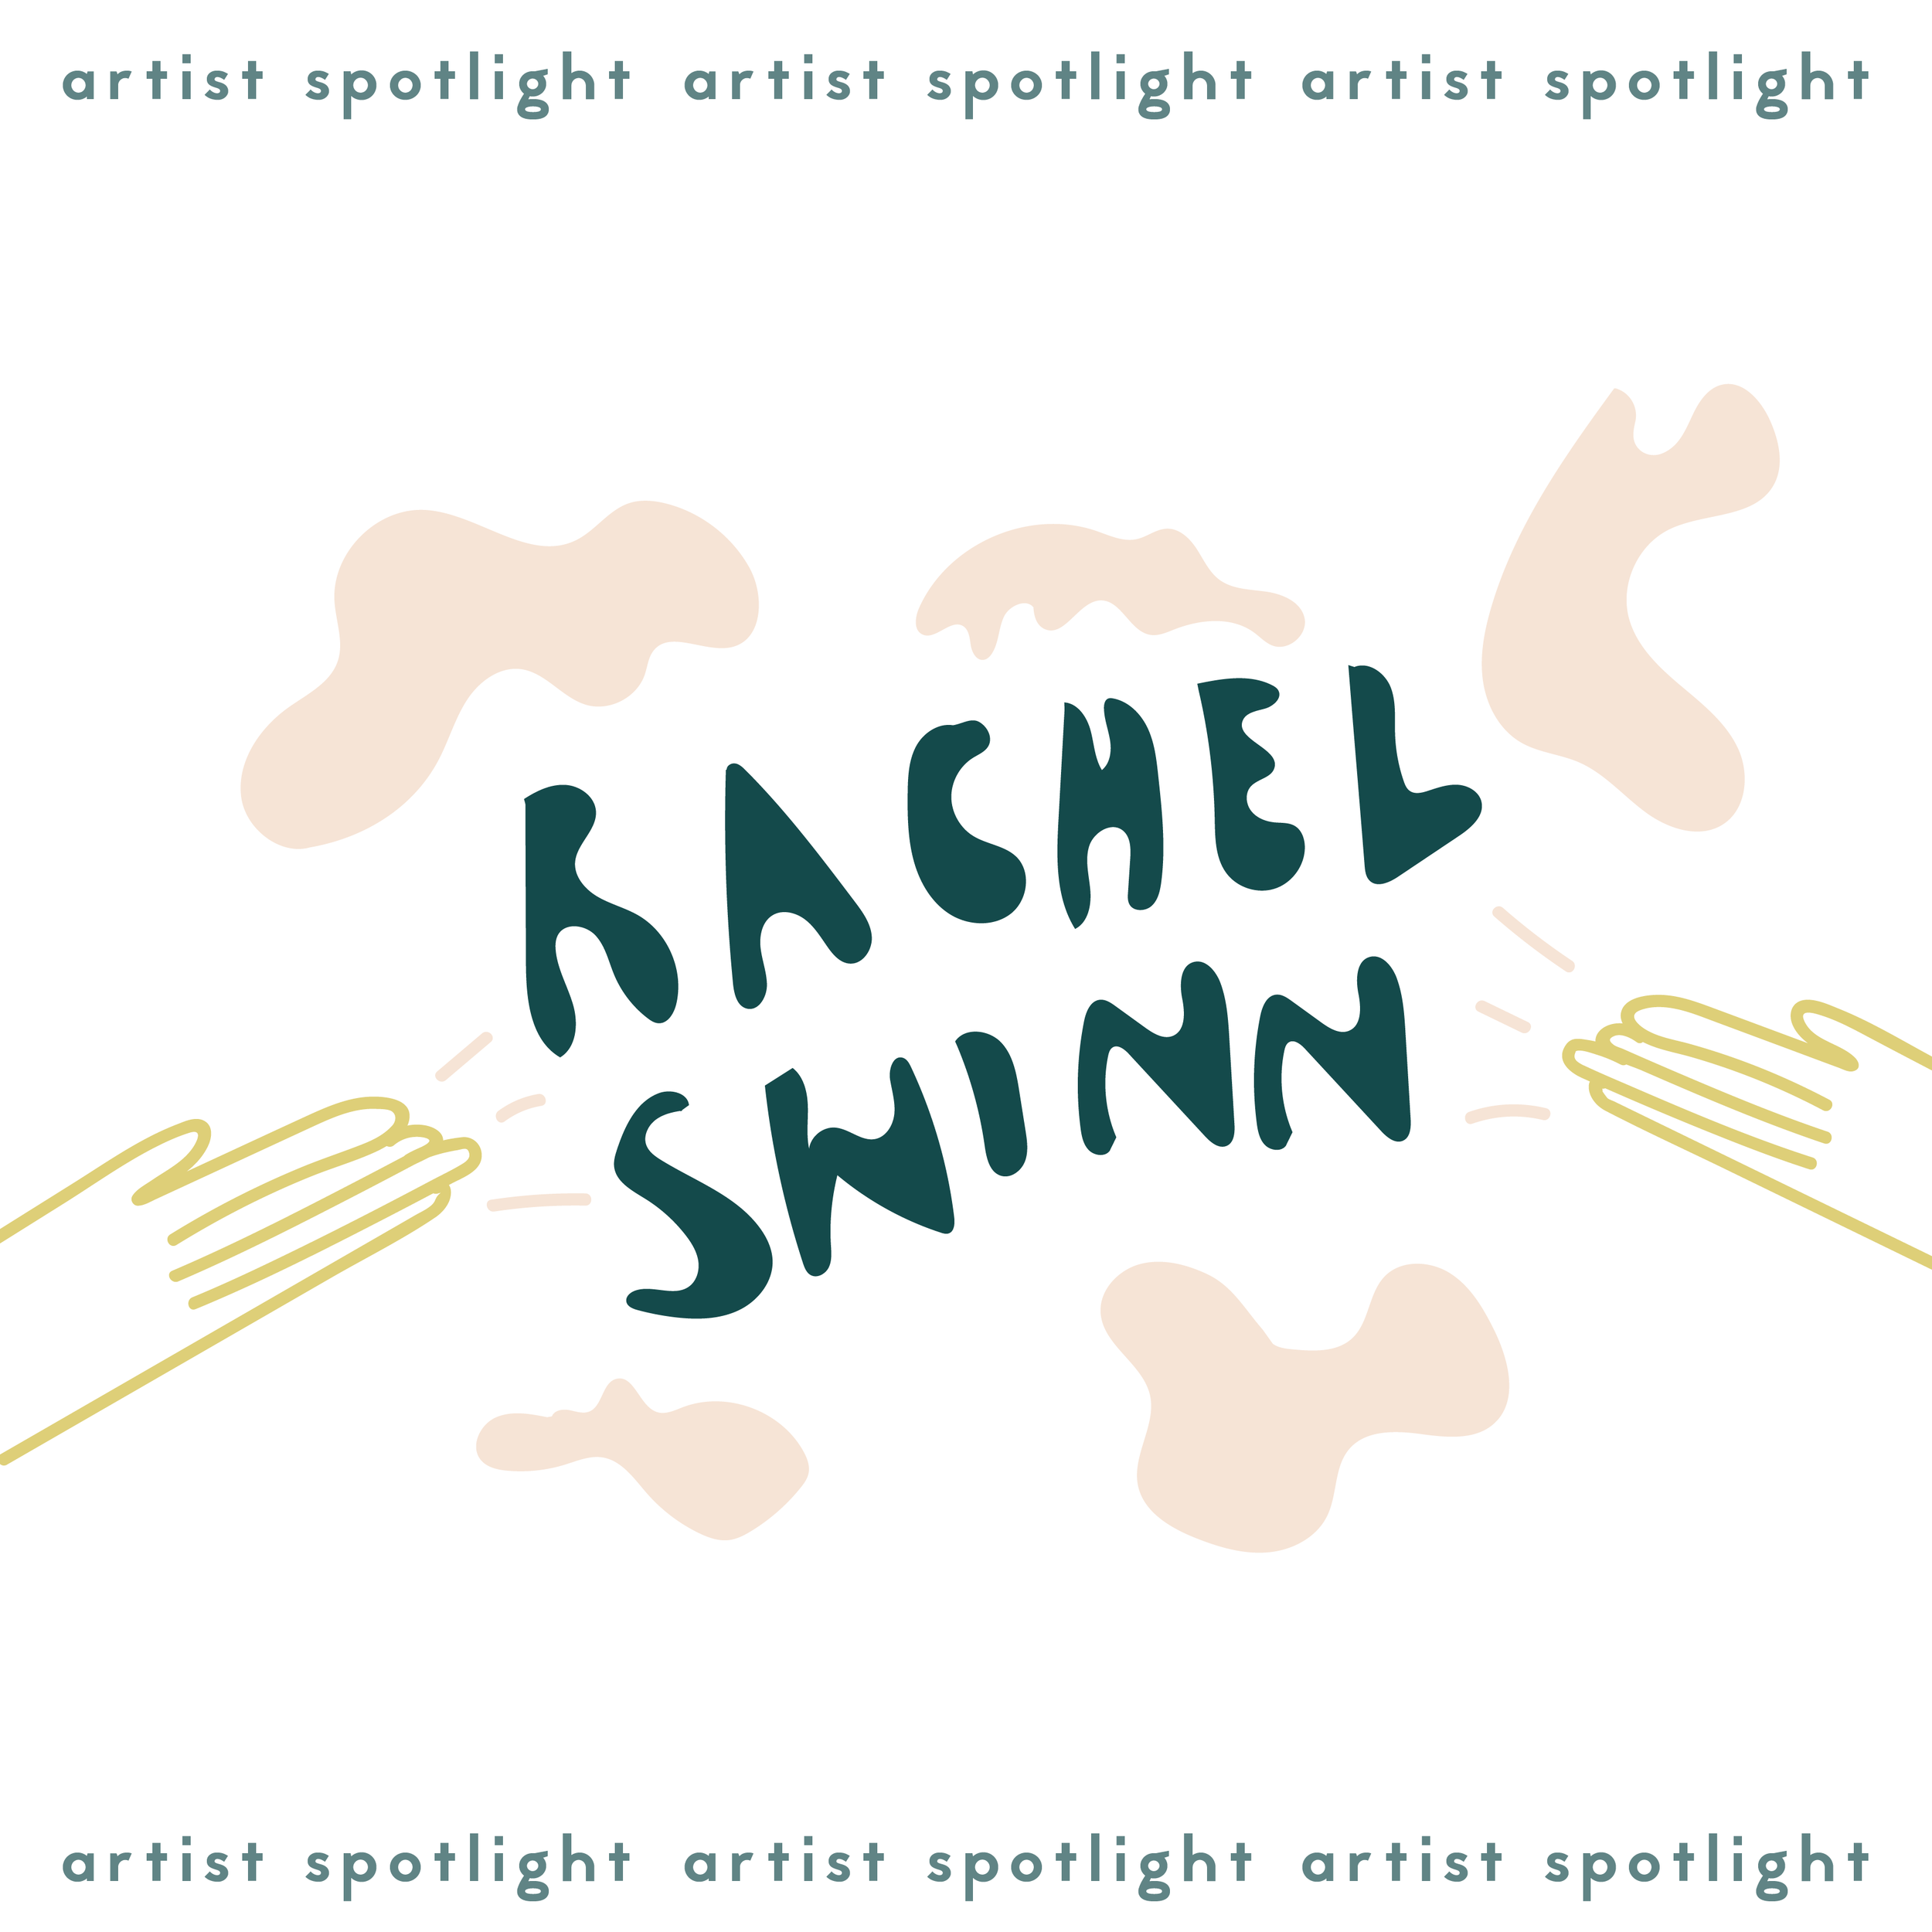 Artist Spotlight: Rachel Swinn